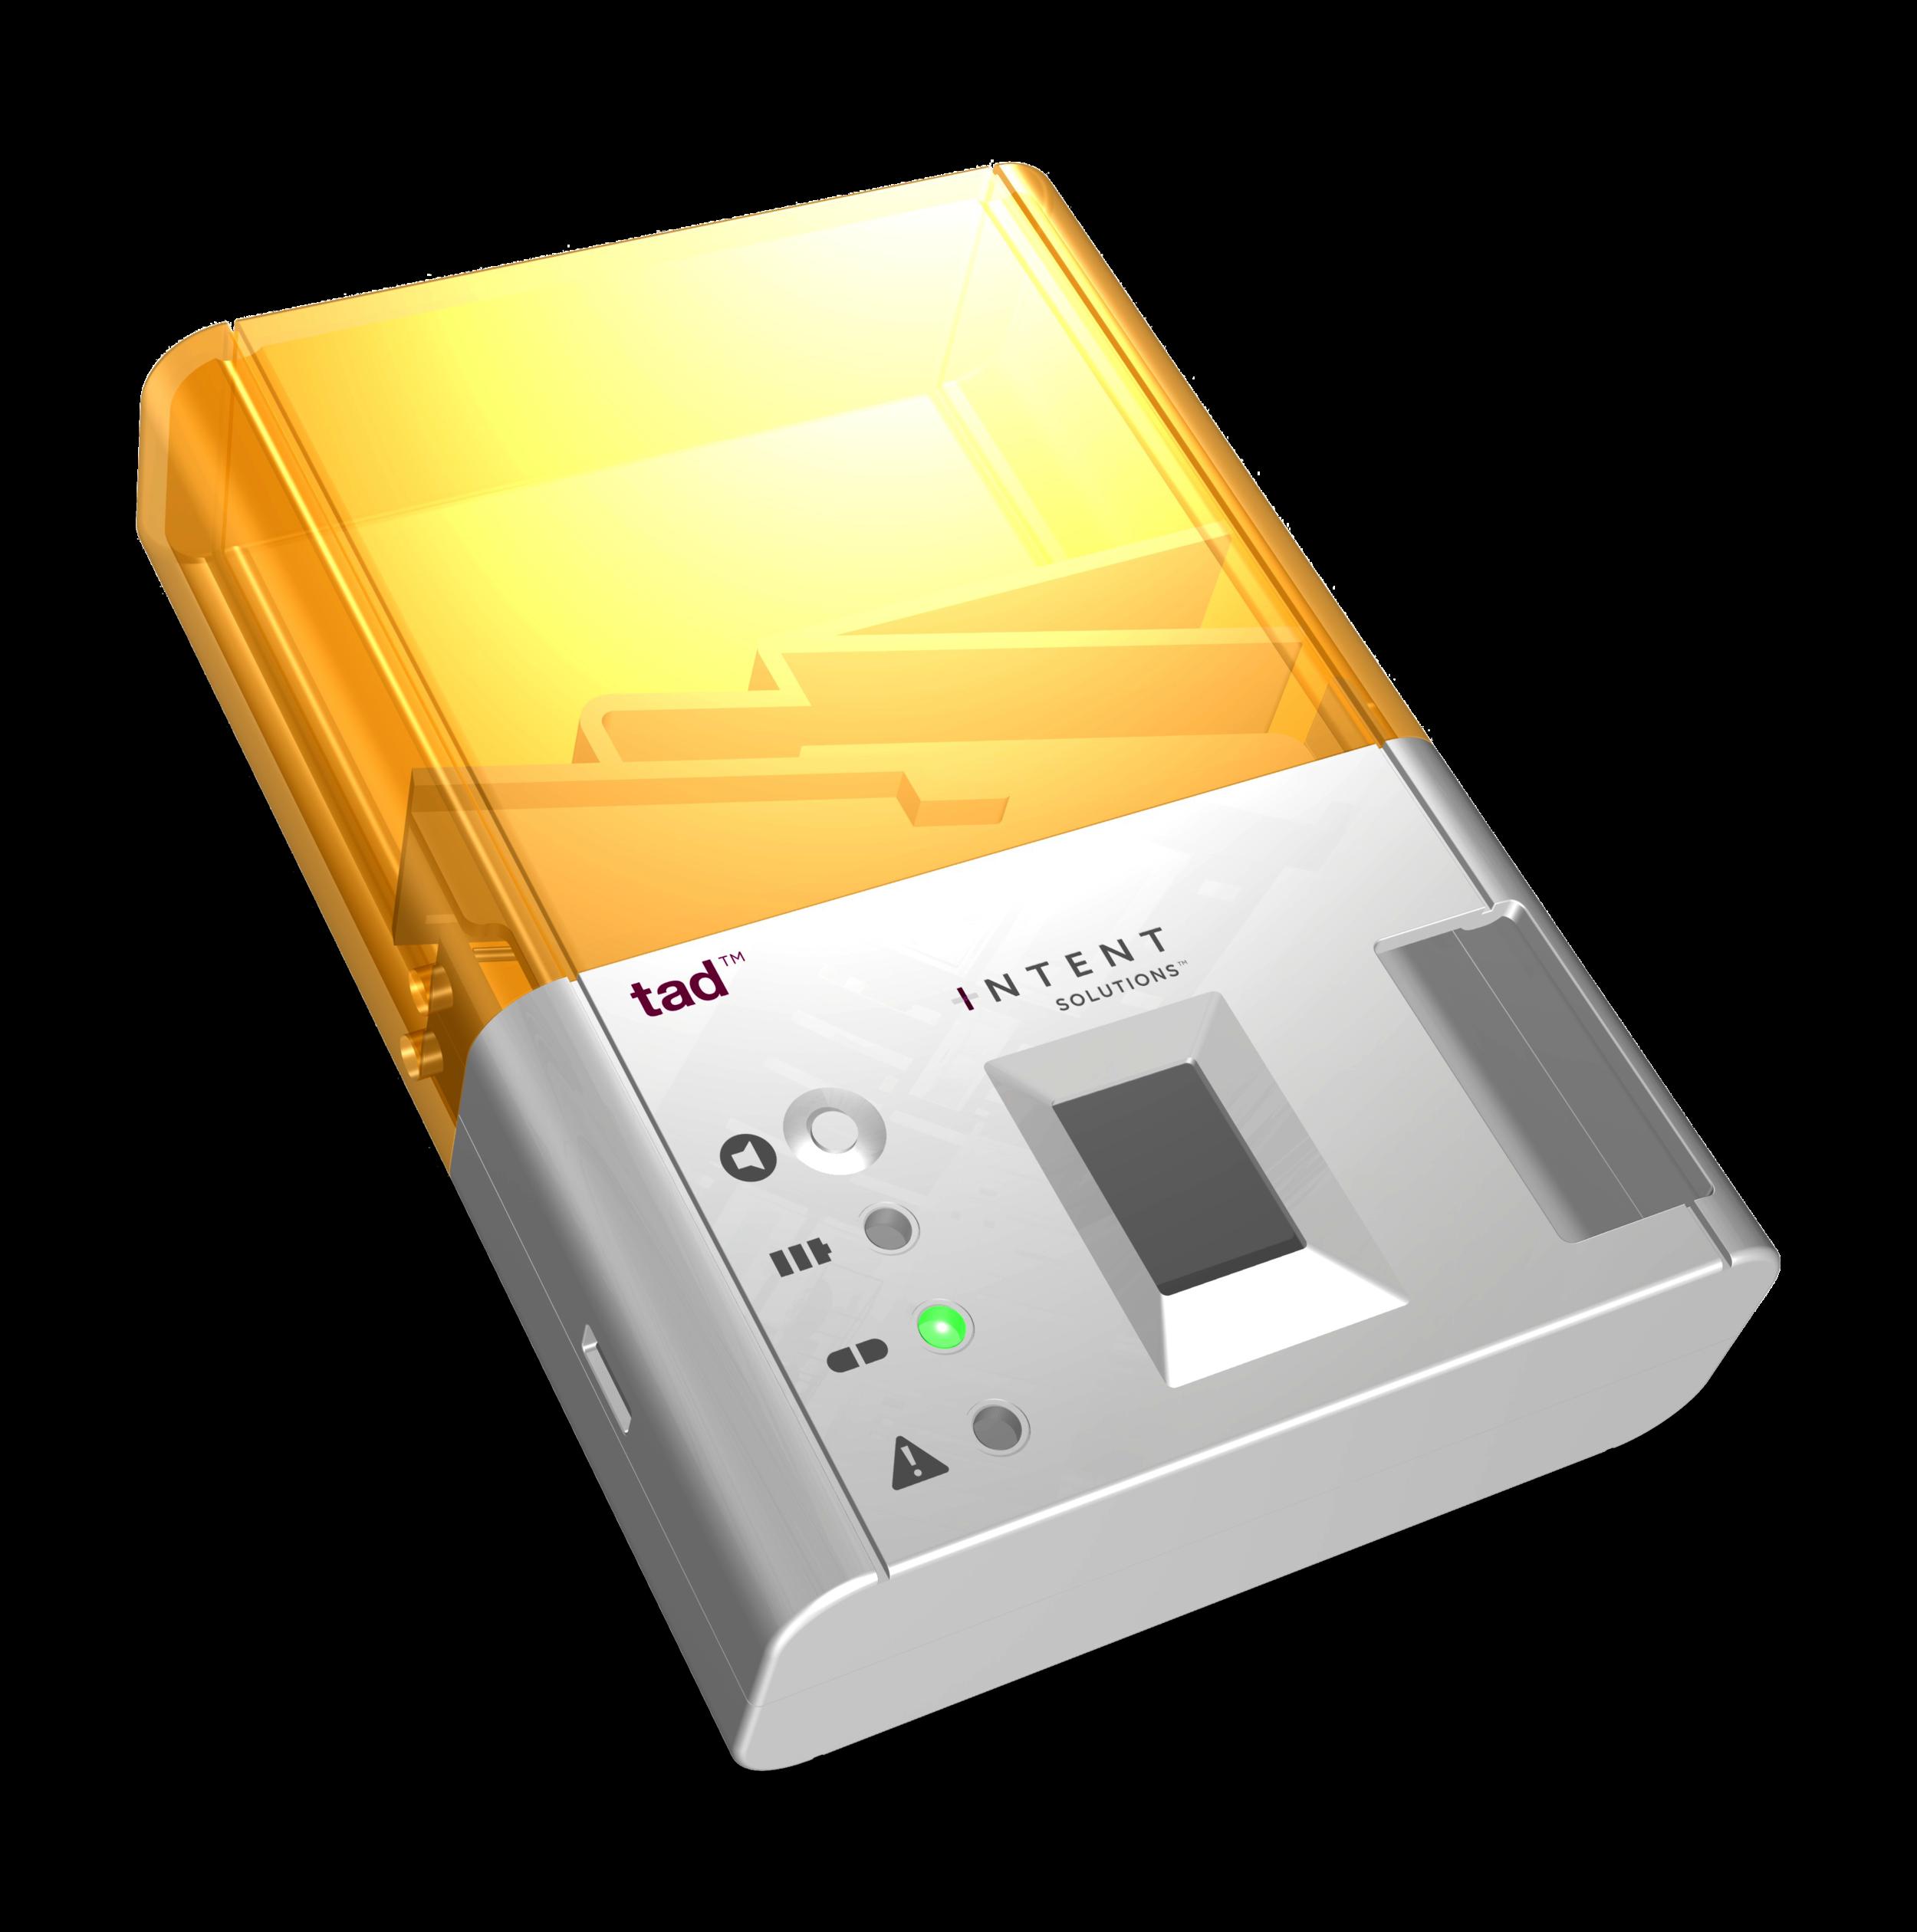 Intent Solutions Smart Portable Medication Dispenser